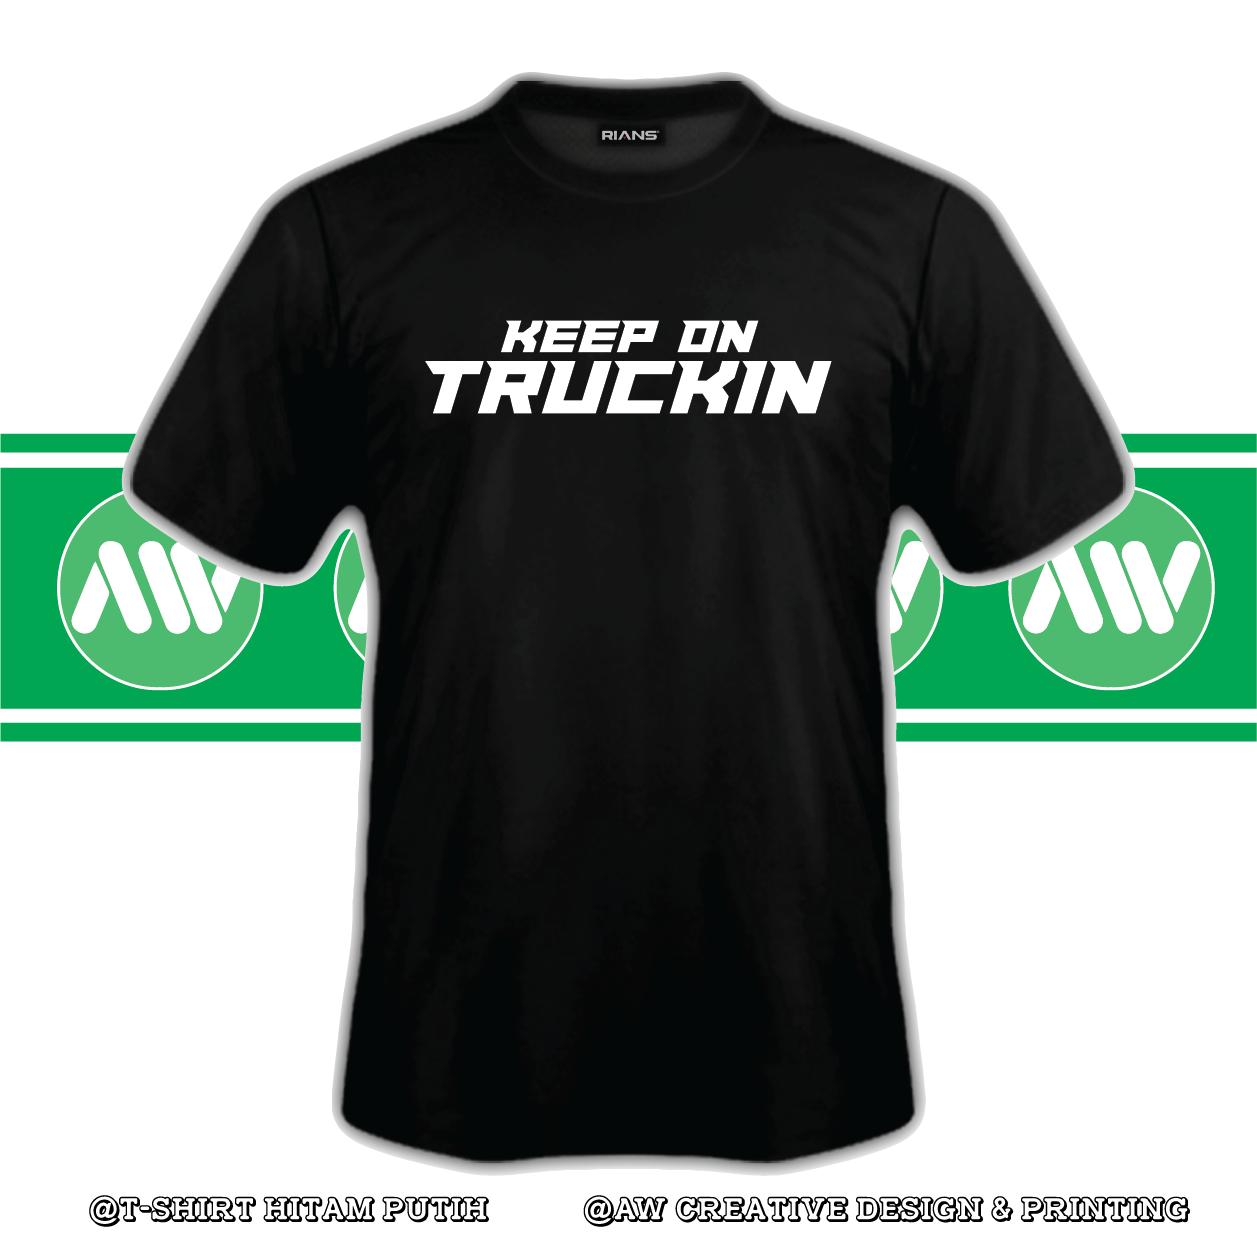 T-Shirt KEEP ON TRUCKIN Abang lori 100% Cotton Baju Tshirt Black White Hitam Putih Bossku